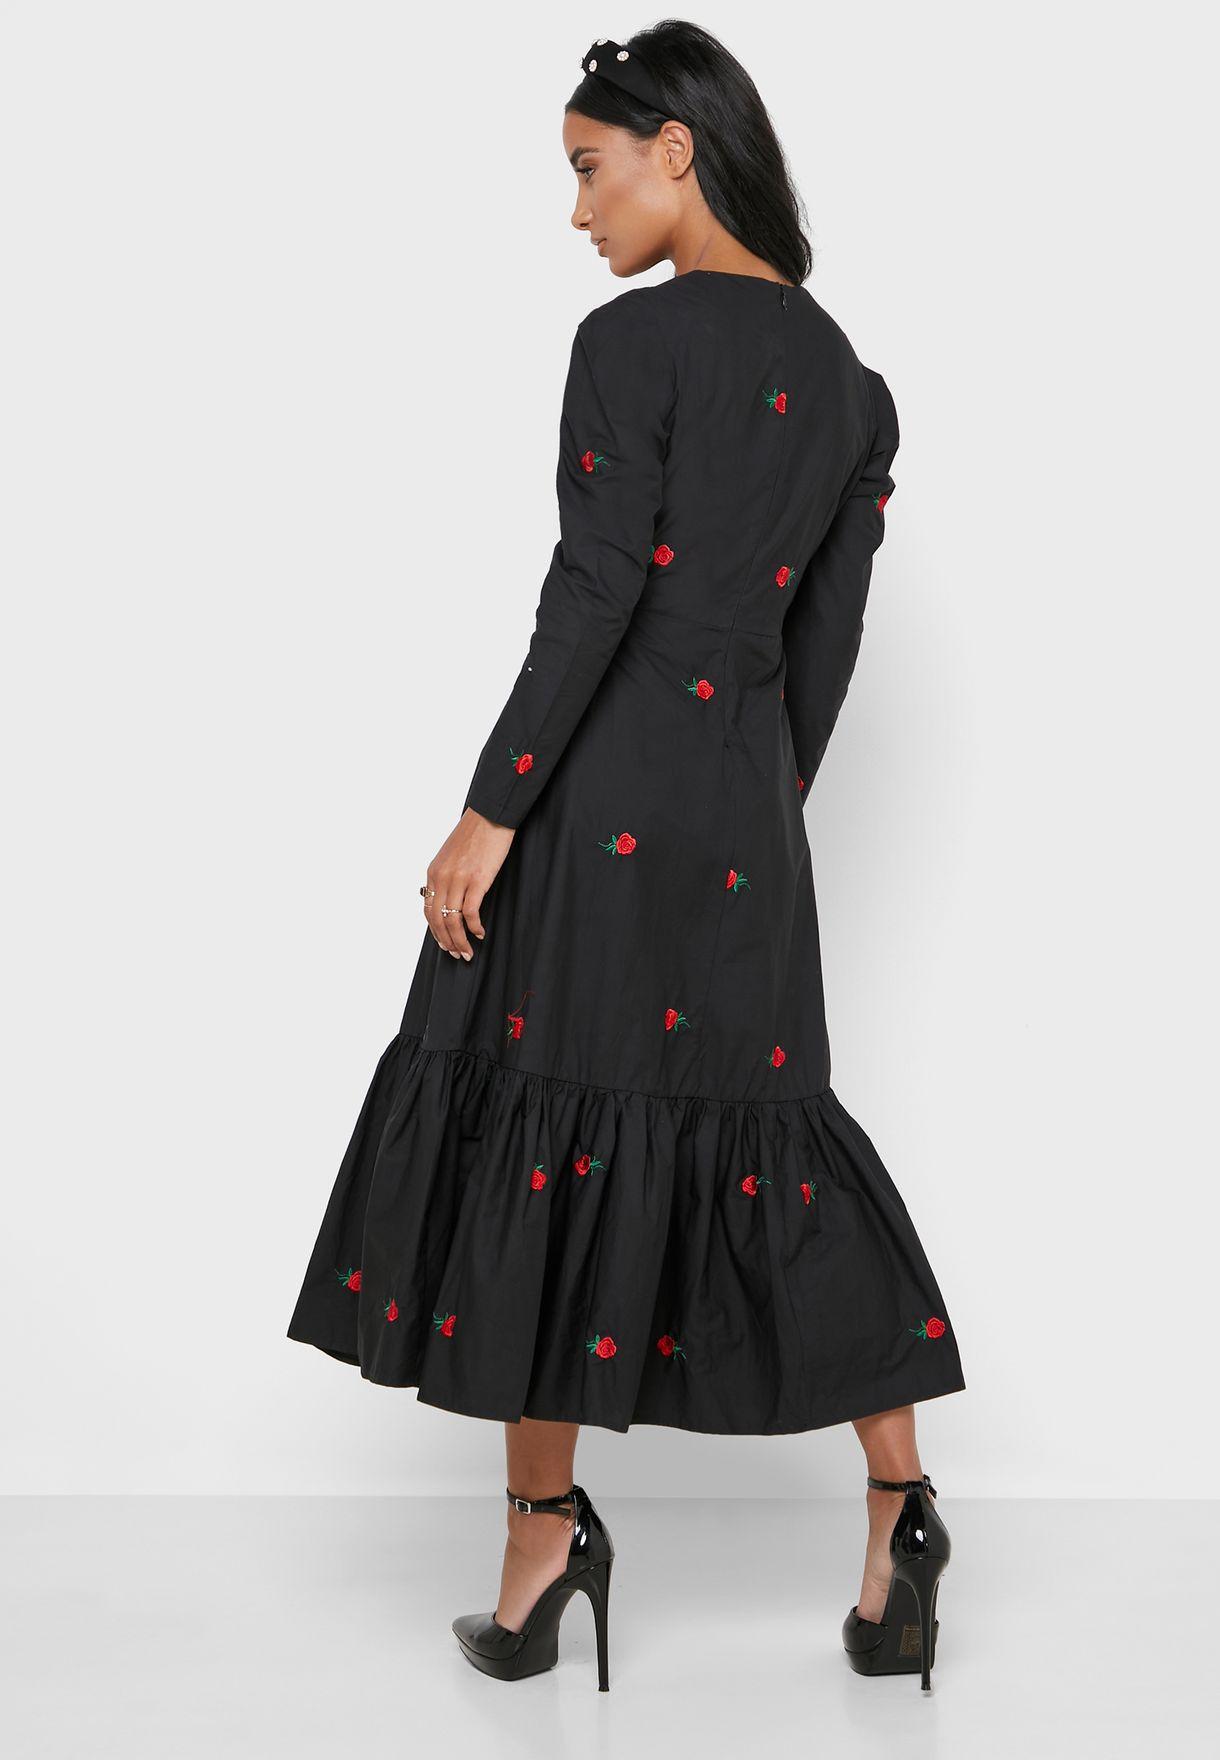 Embroidery Detail Ruffle Hem Dress